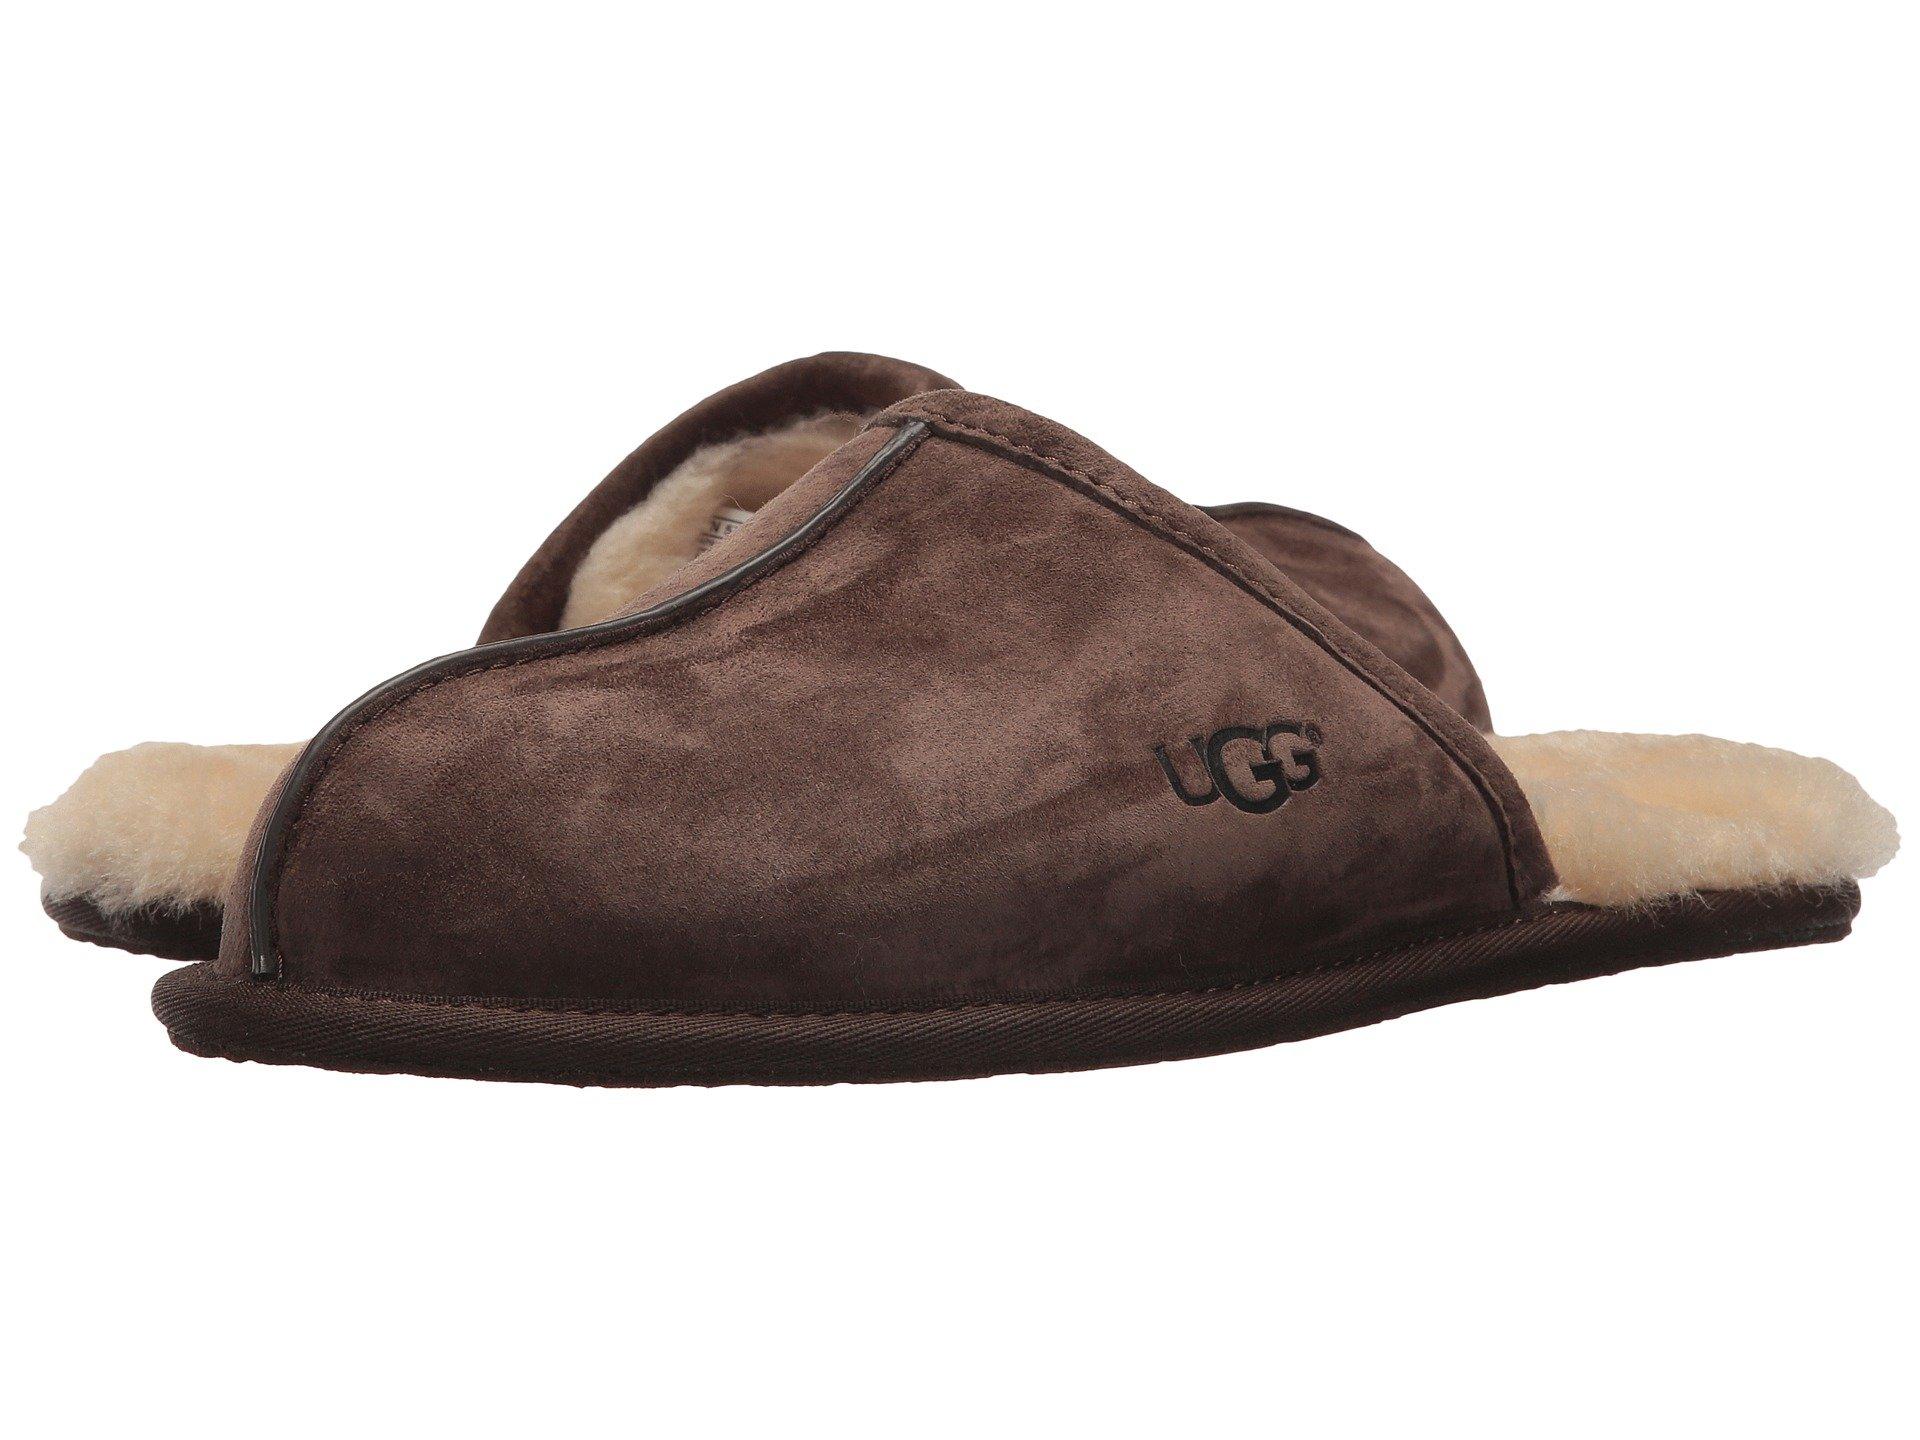 Zapatos de Descanso para Hombre UGG Scuff  + UGG en VeoyCompro.net